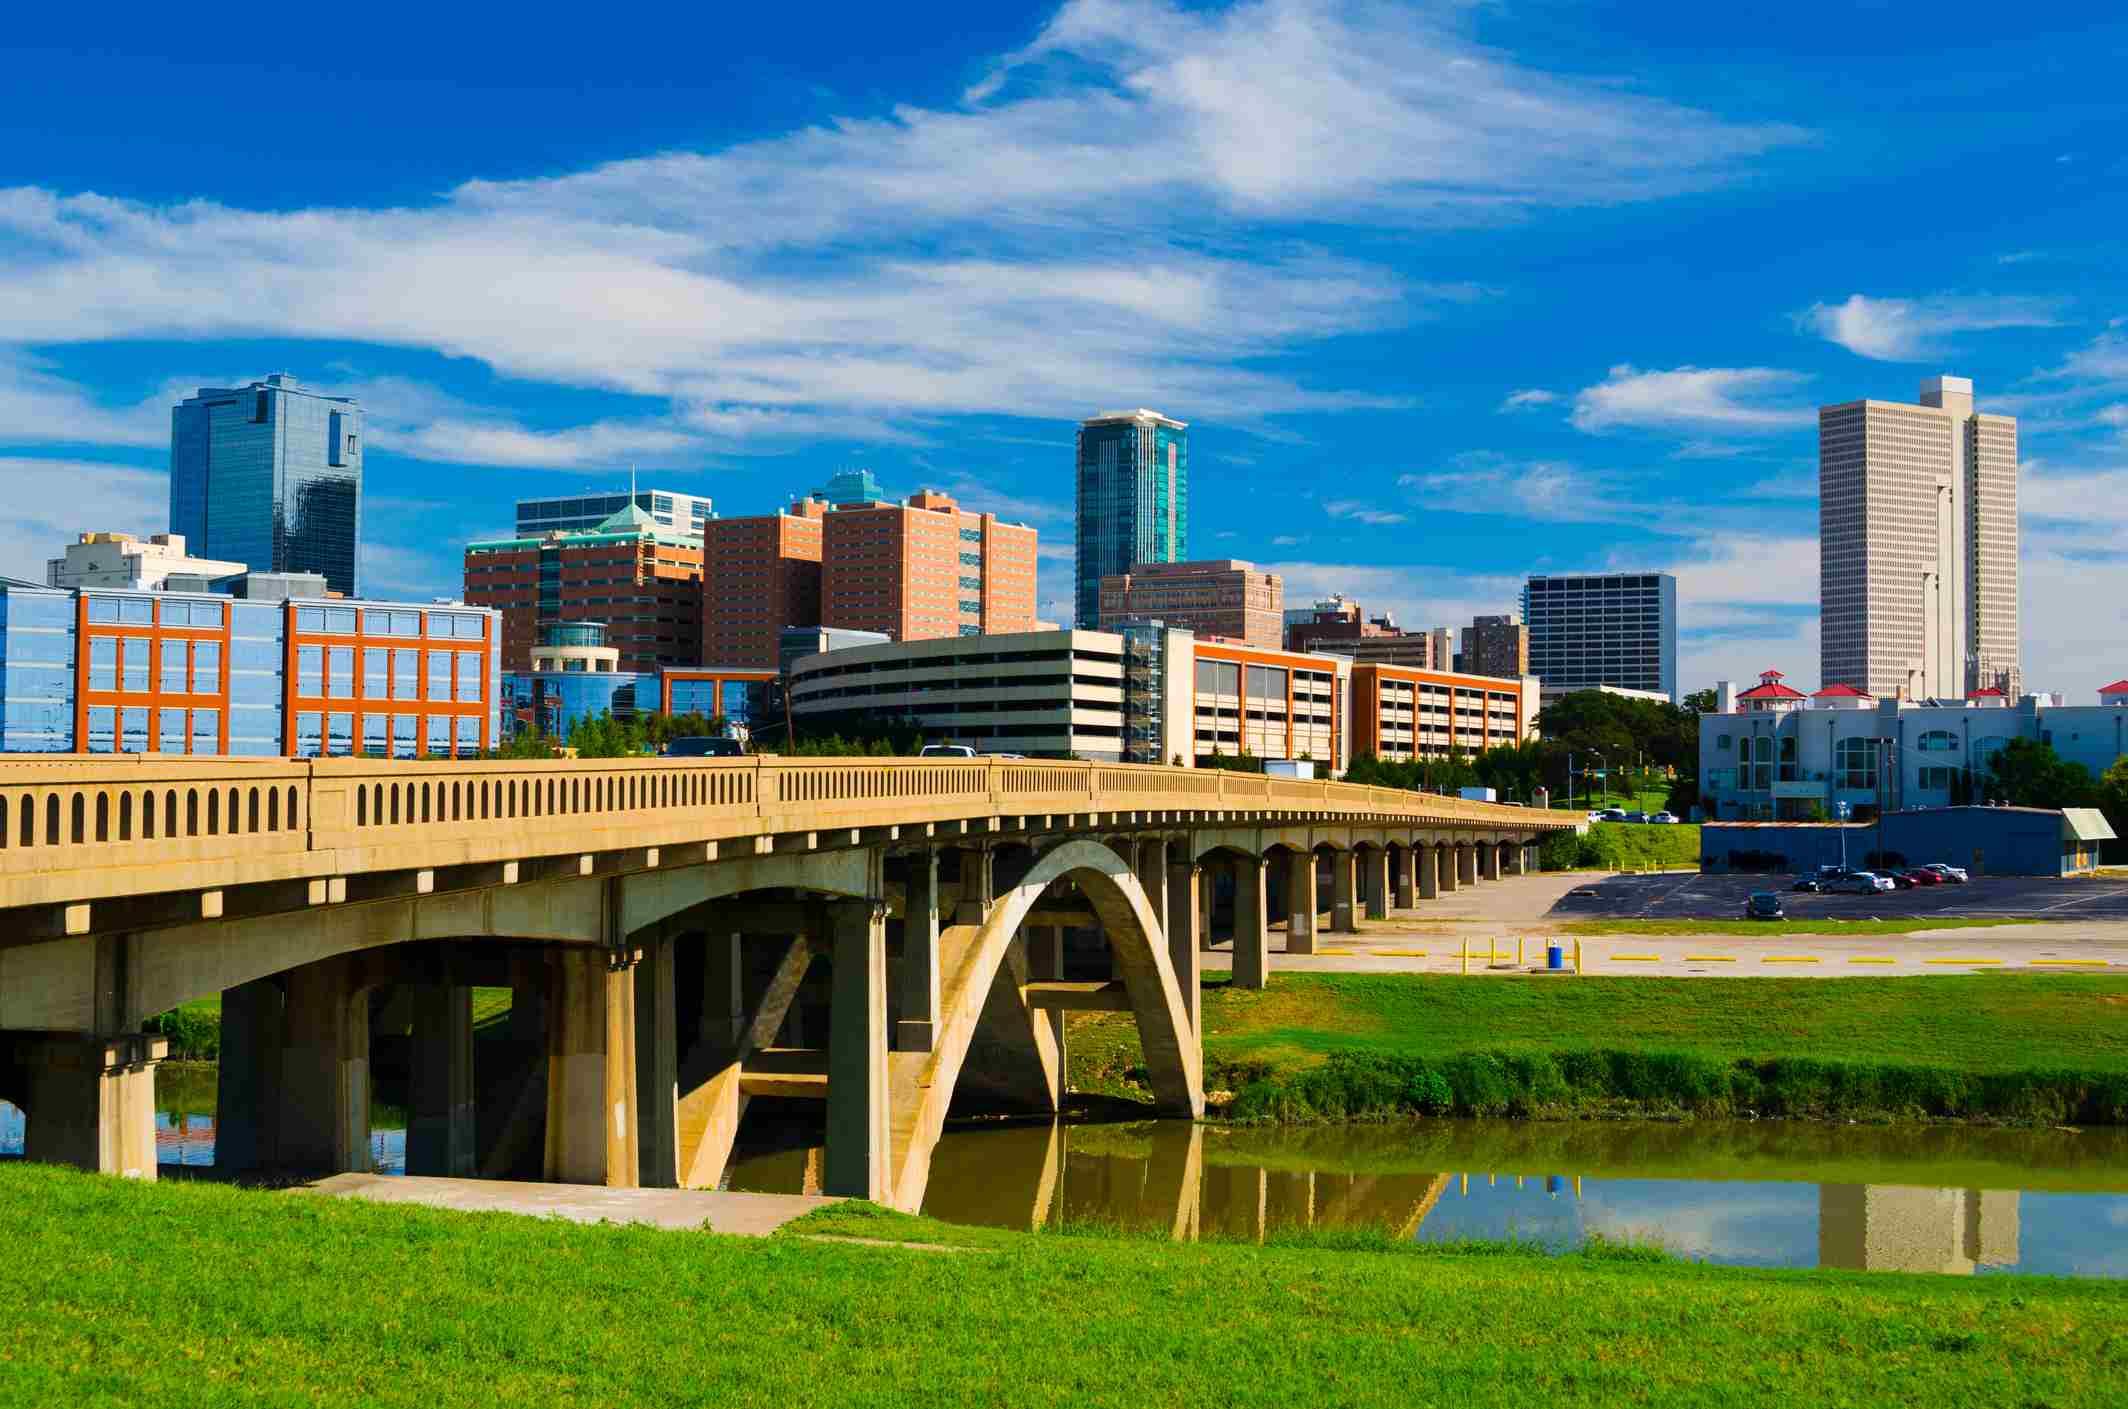 Fort Worth skyline and bridge